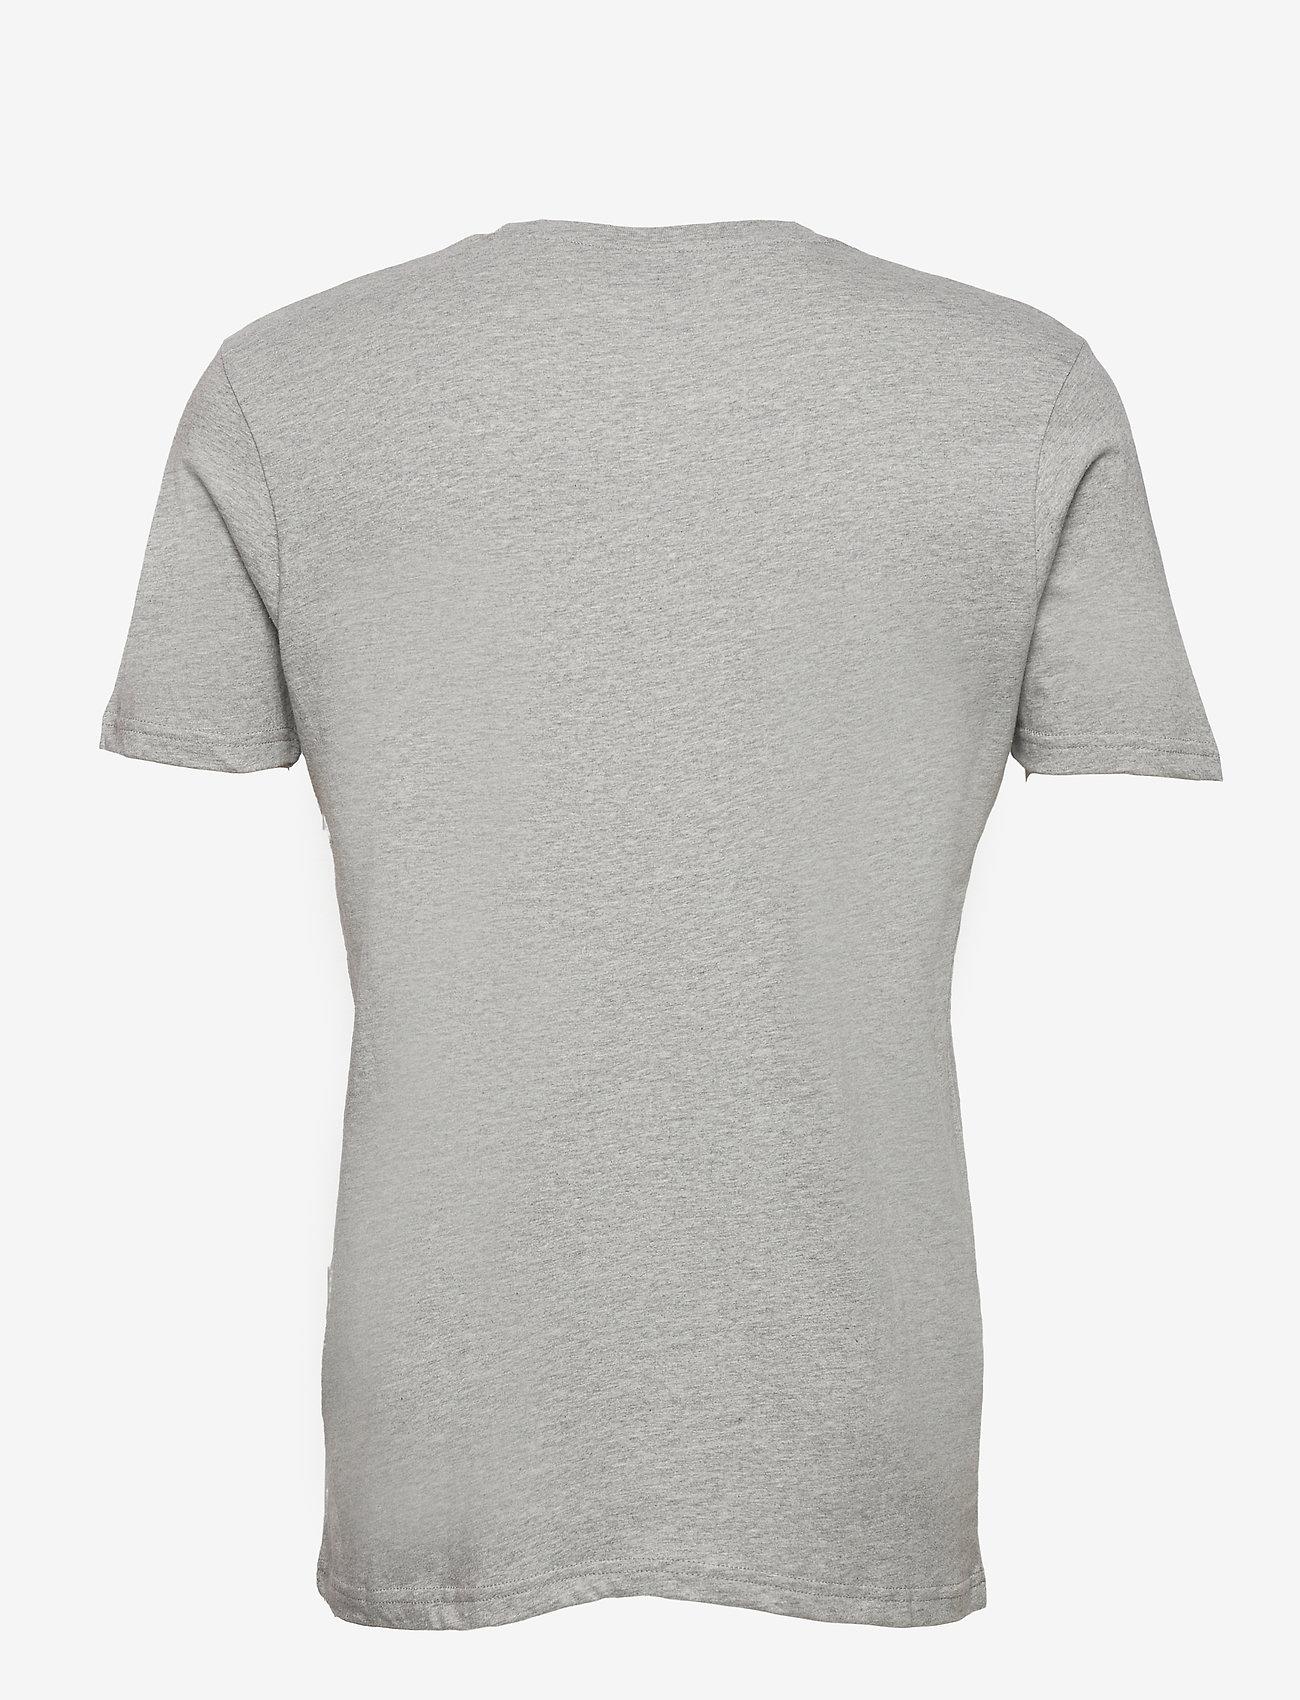 Ellesse EL PRADO (NEW LOGO) - T-skjorter GREY MARL - Menn Klær